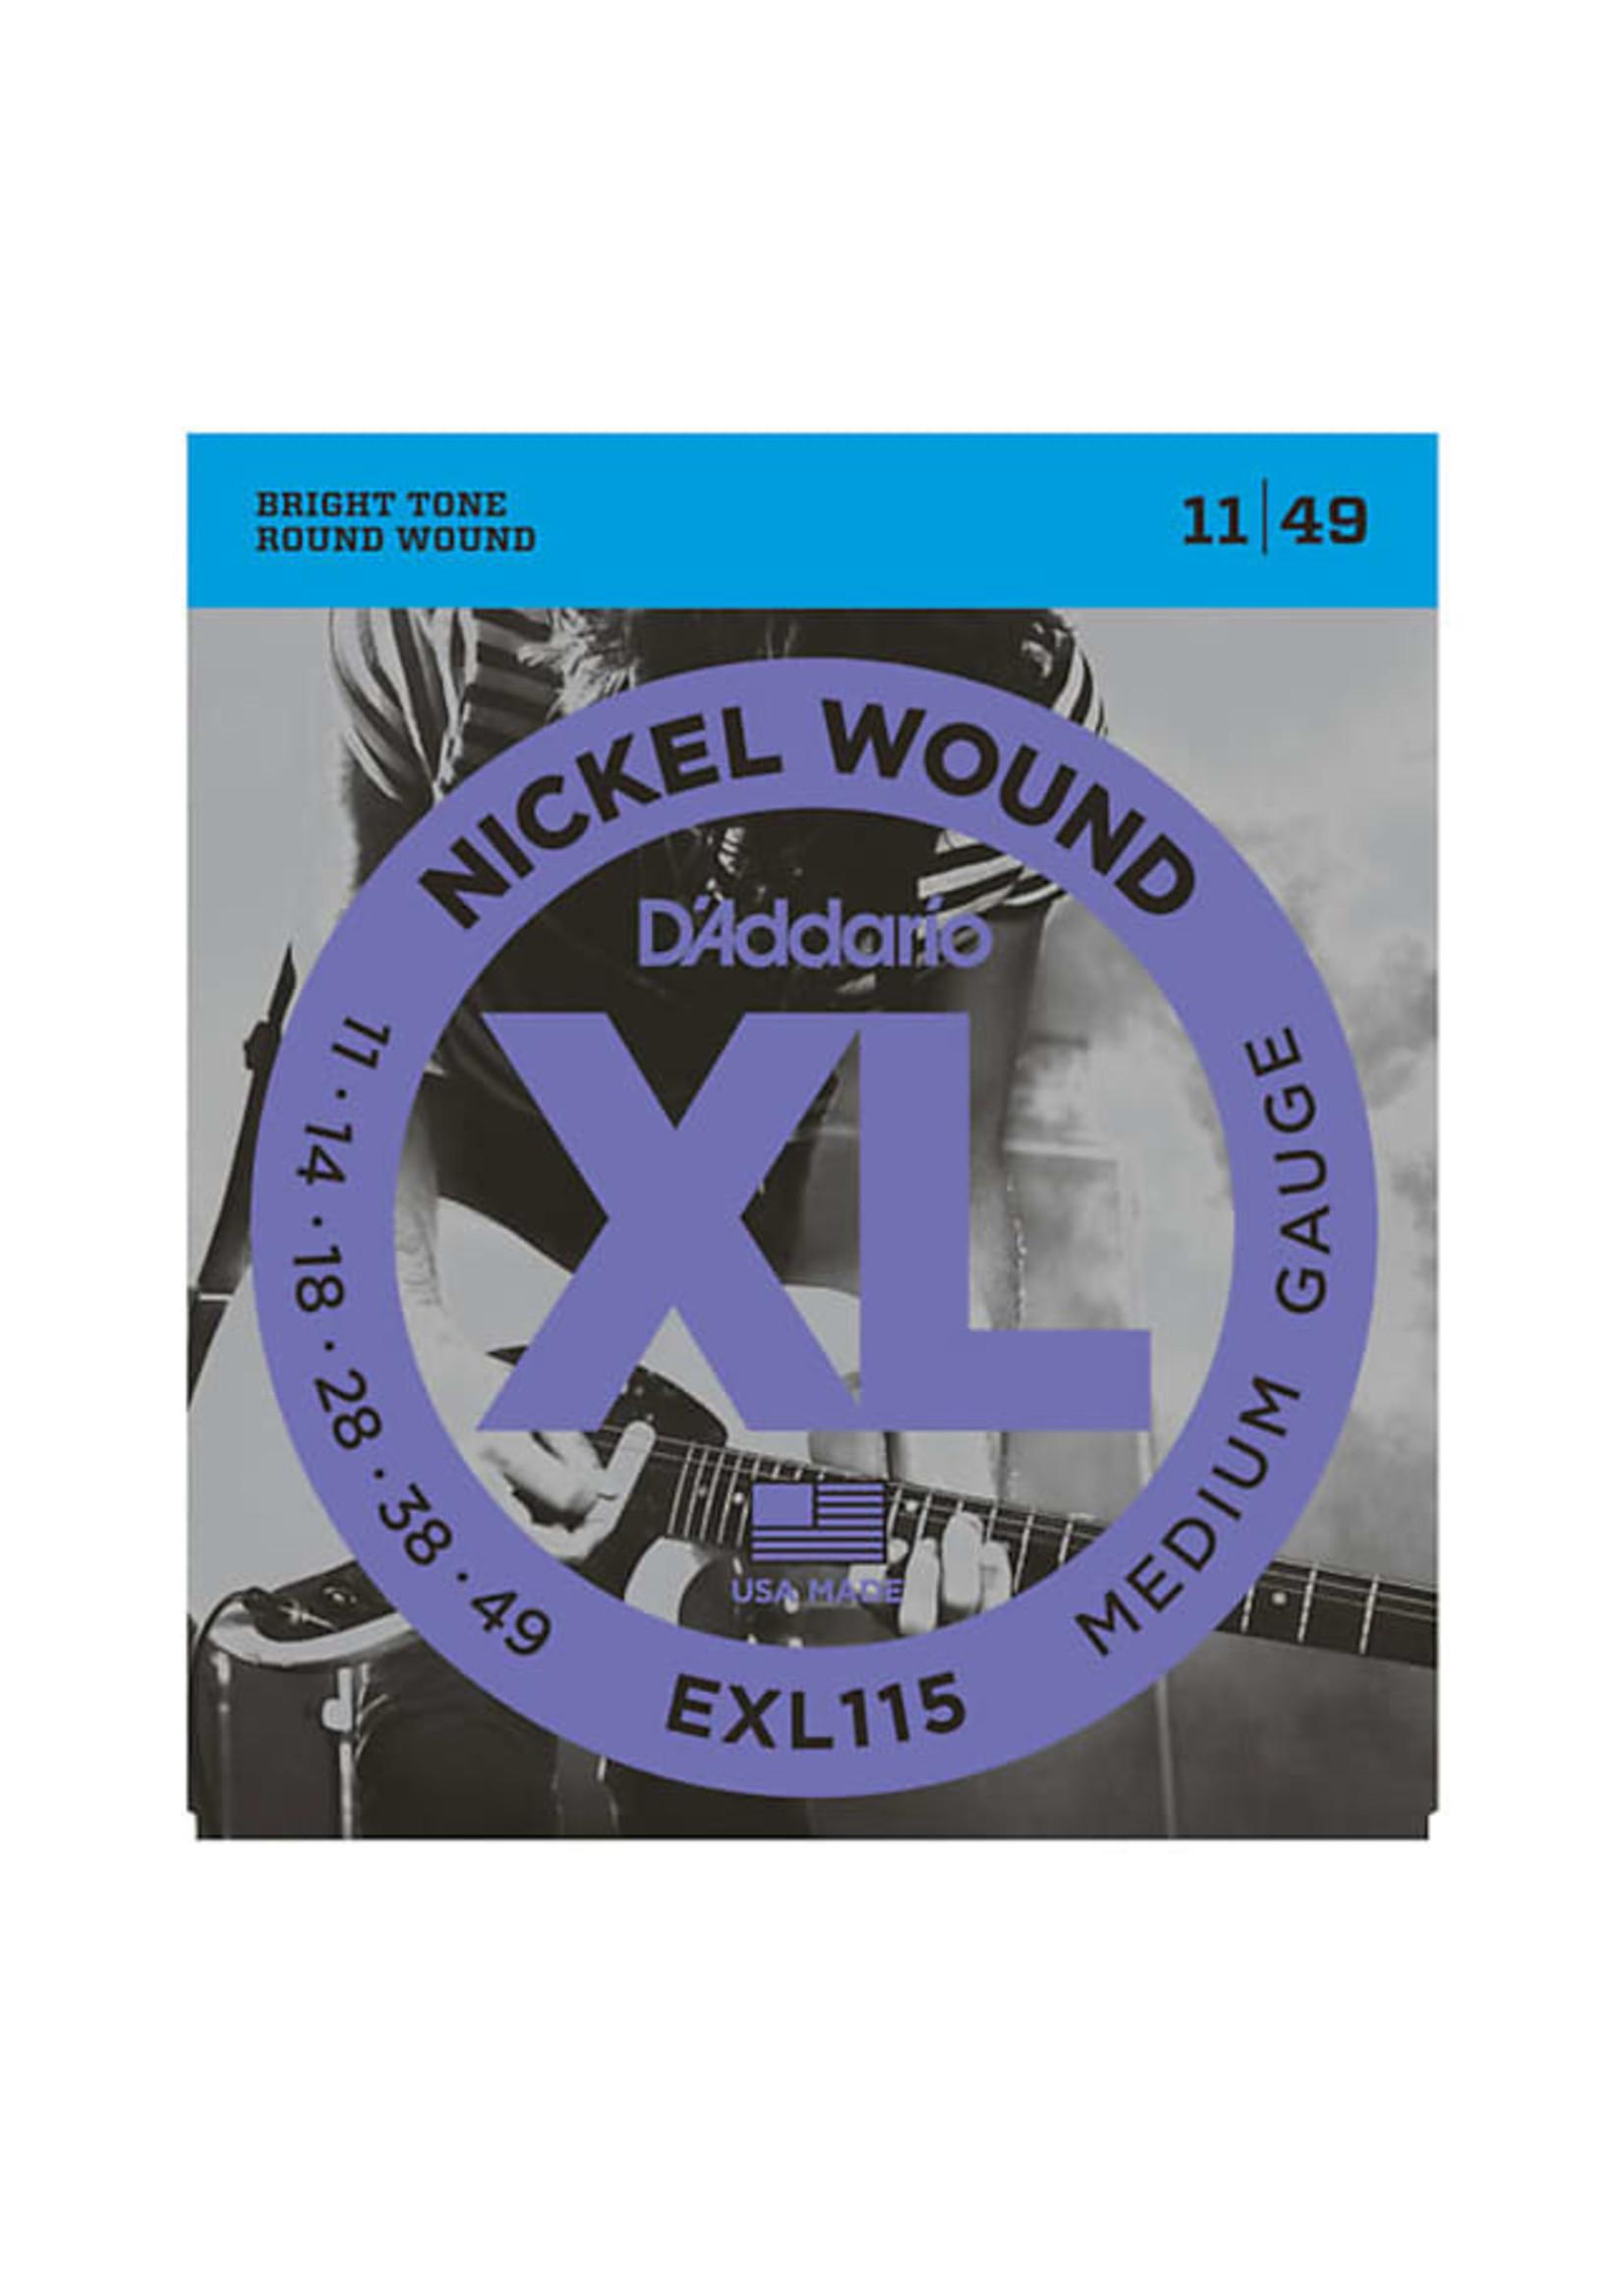 D'Addario D'Addario EXL115 11-49 Electric Guitar Strings